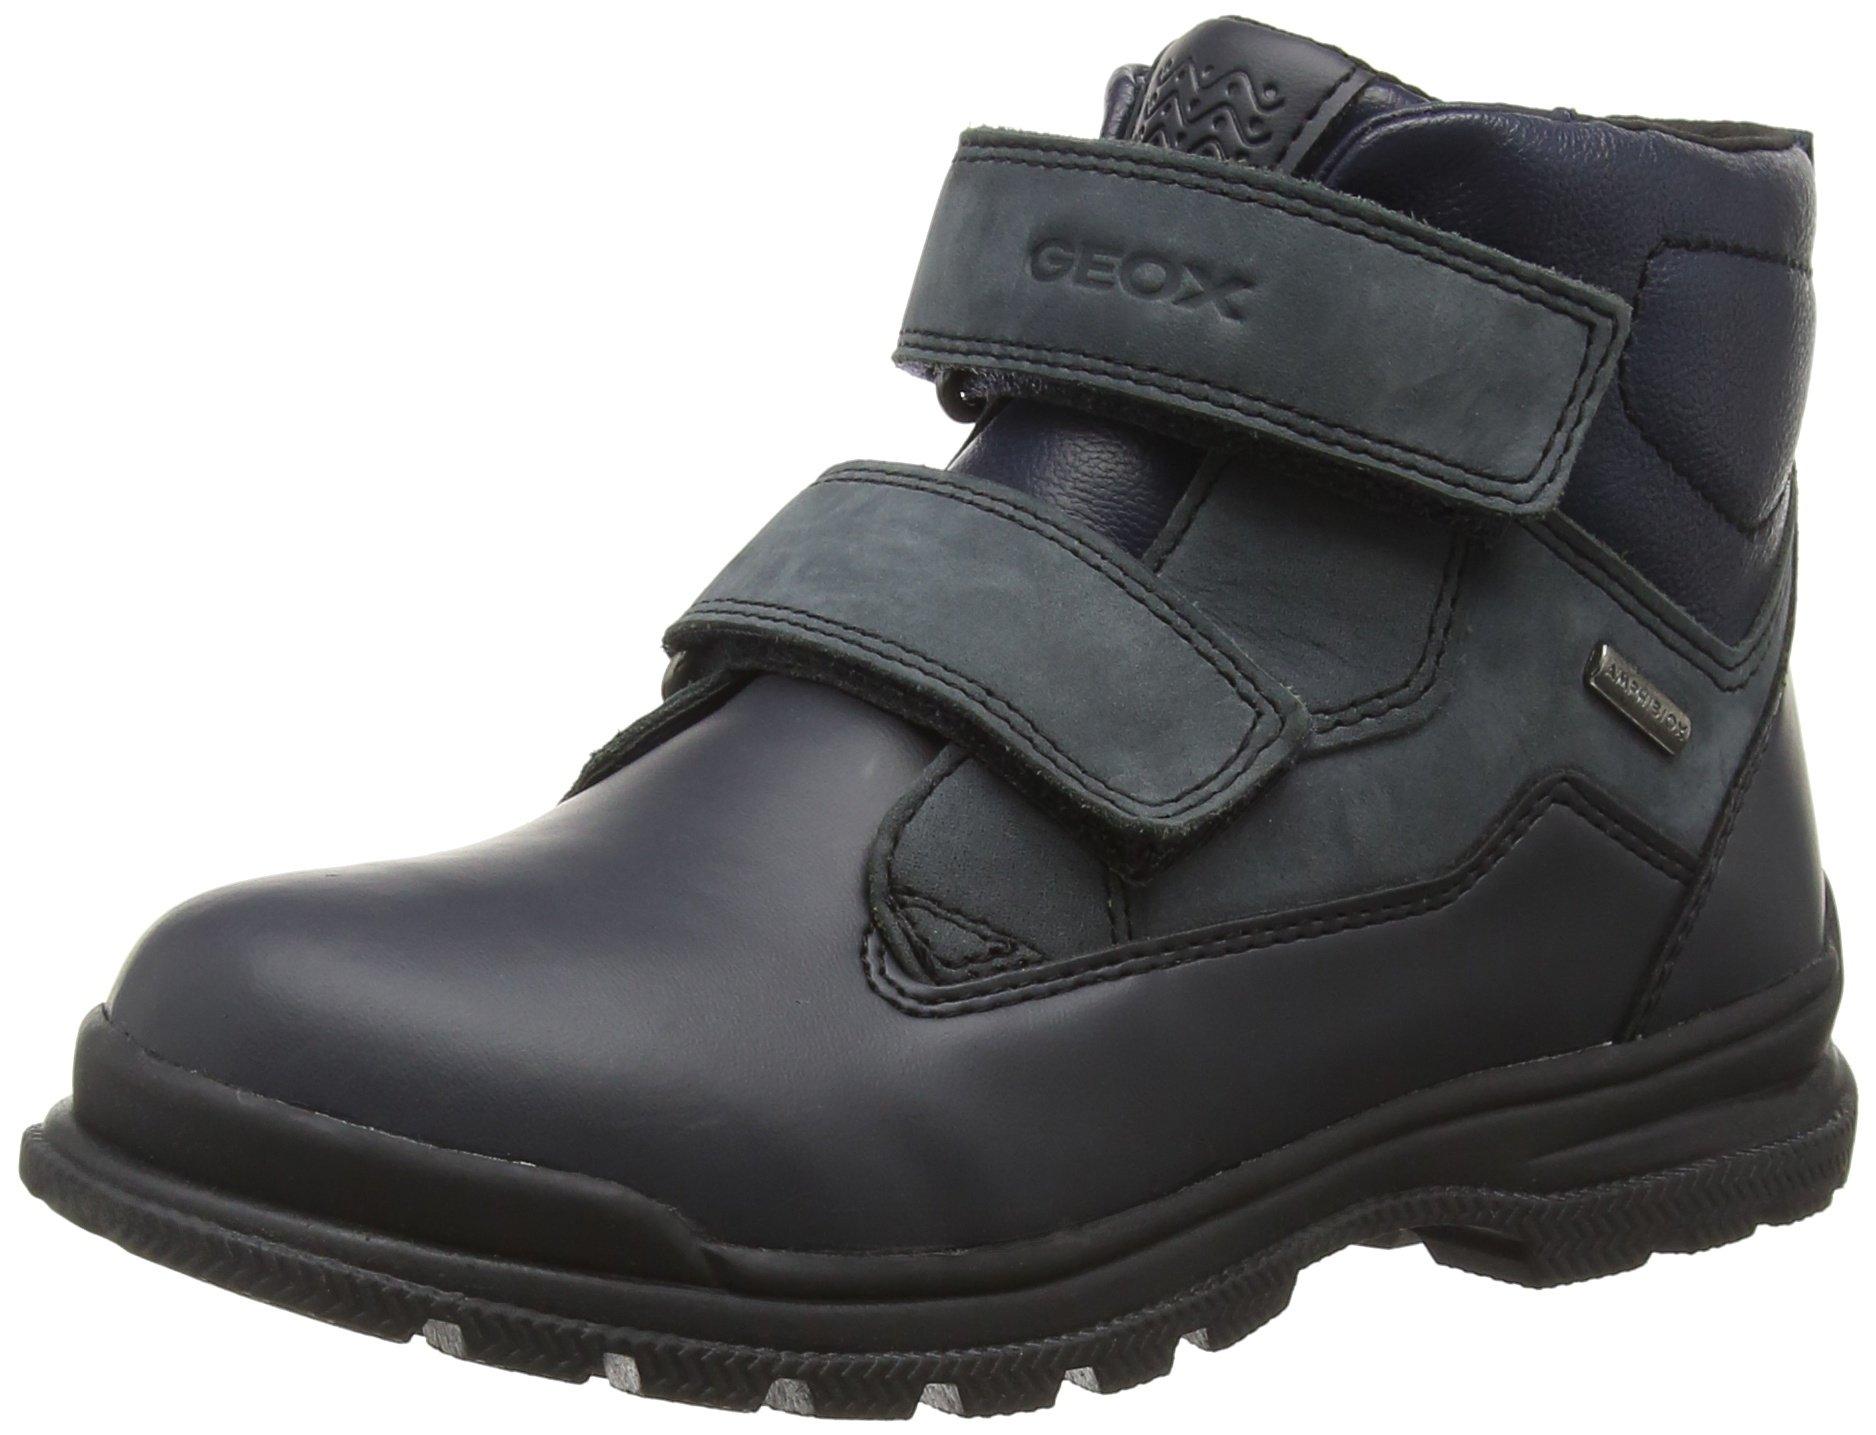 Geox Boys J William Waterproof Velcro Snow Boot Shoe, Navy/Blue, 28